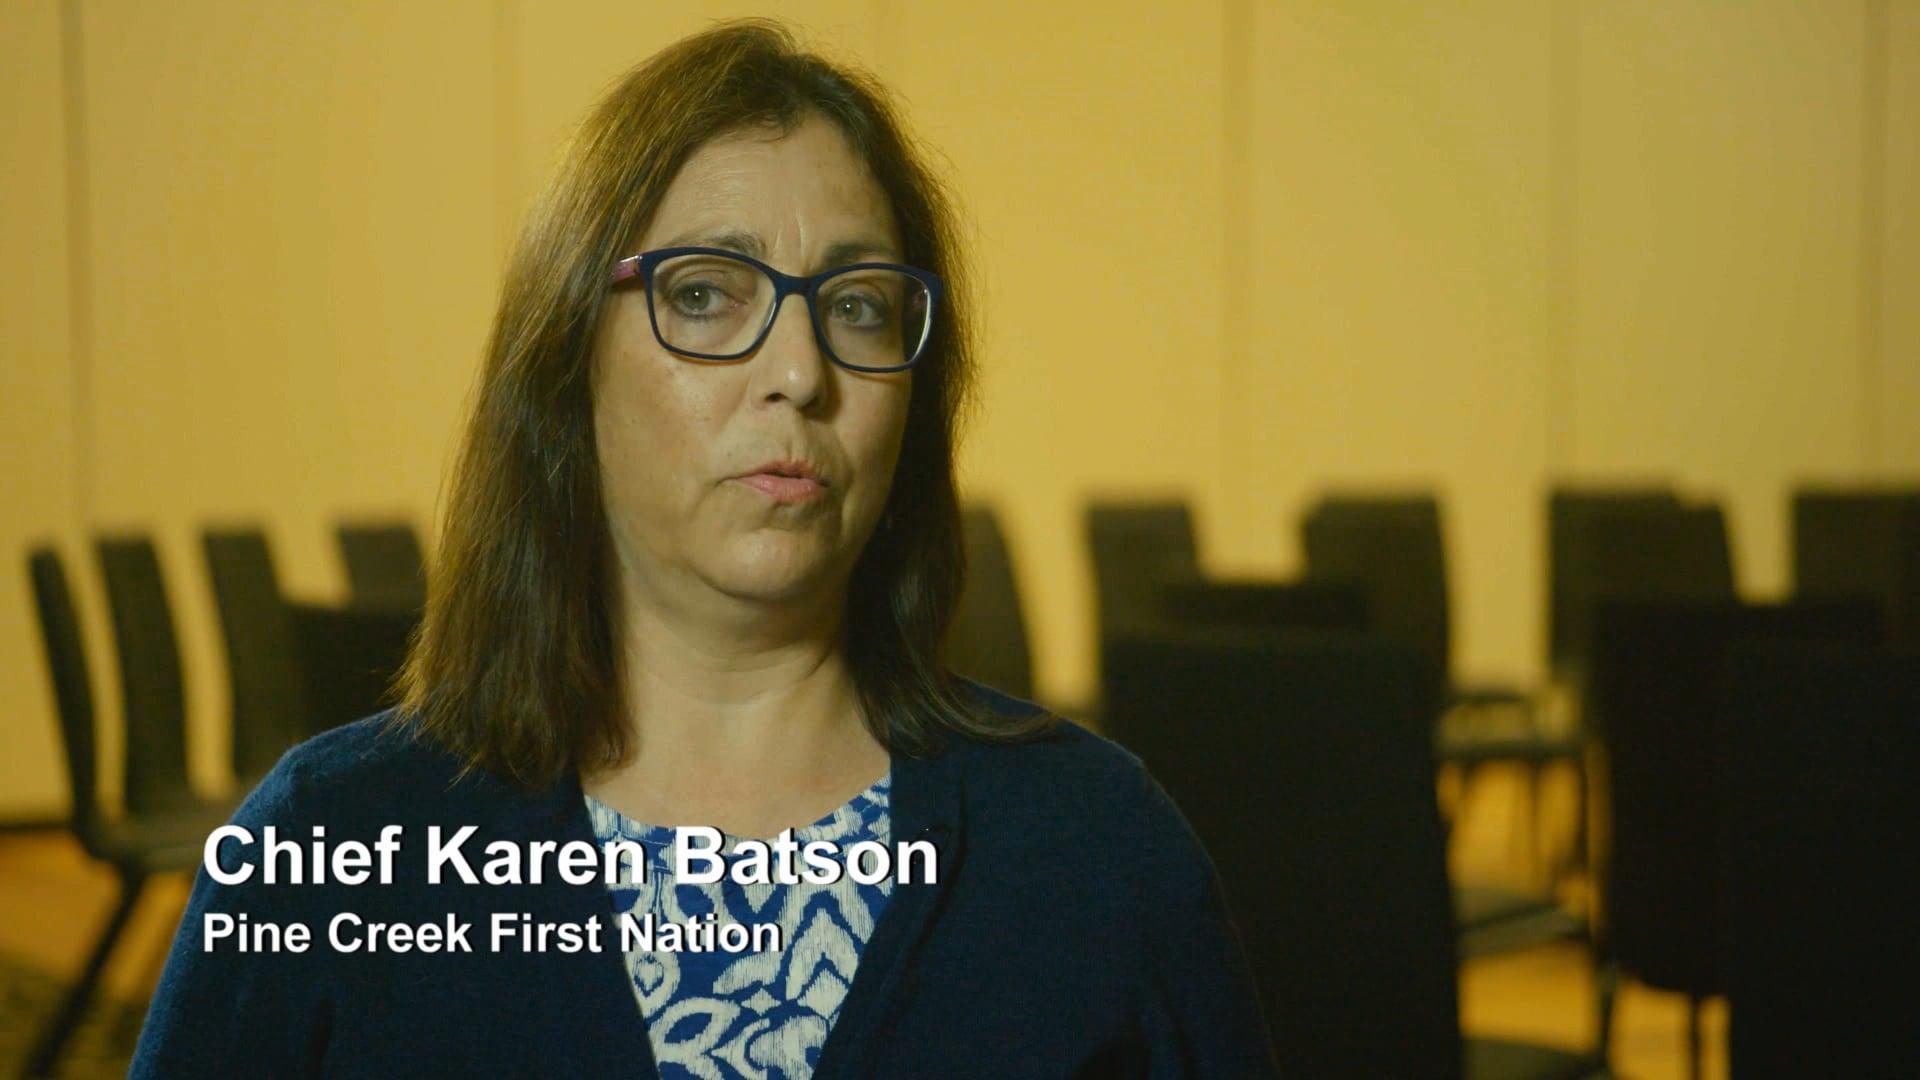 Chief Karen Batson